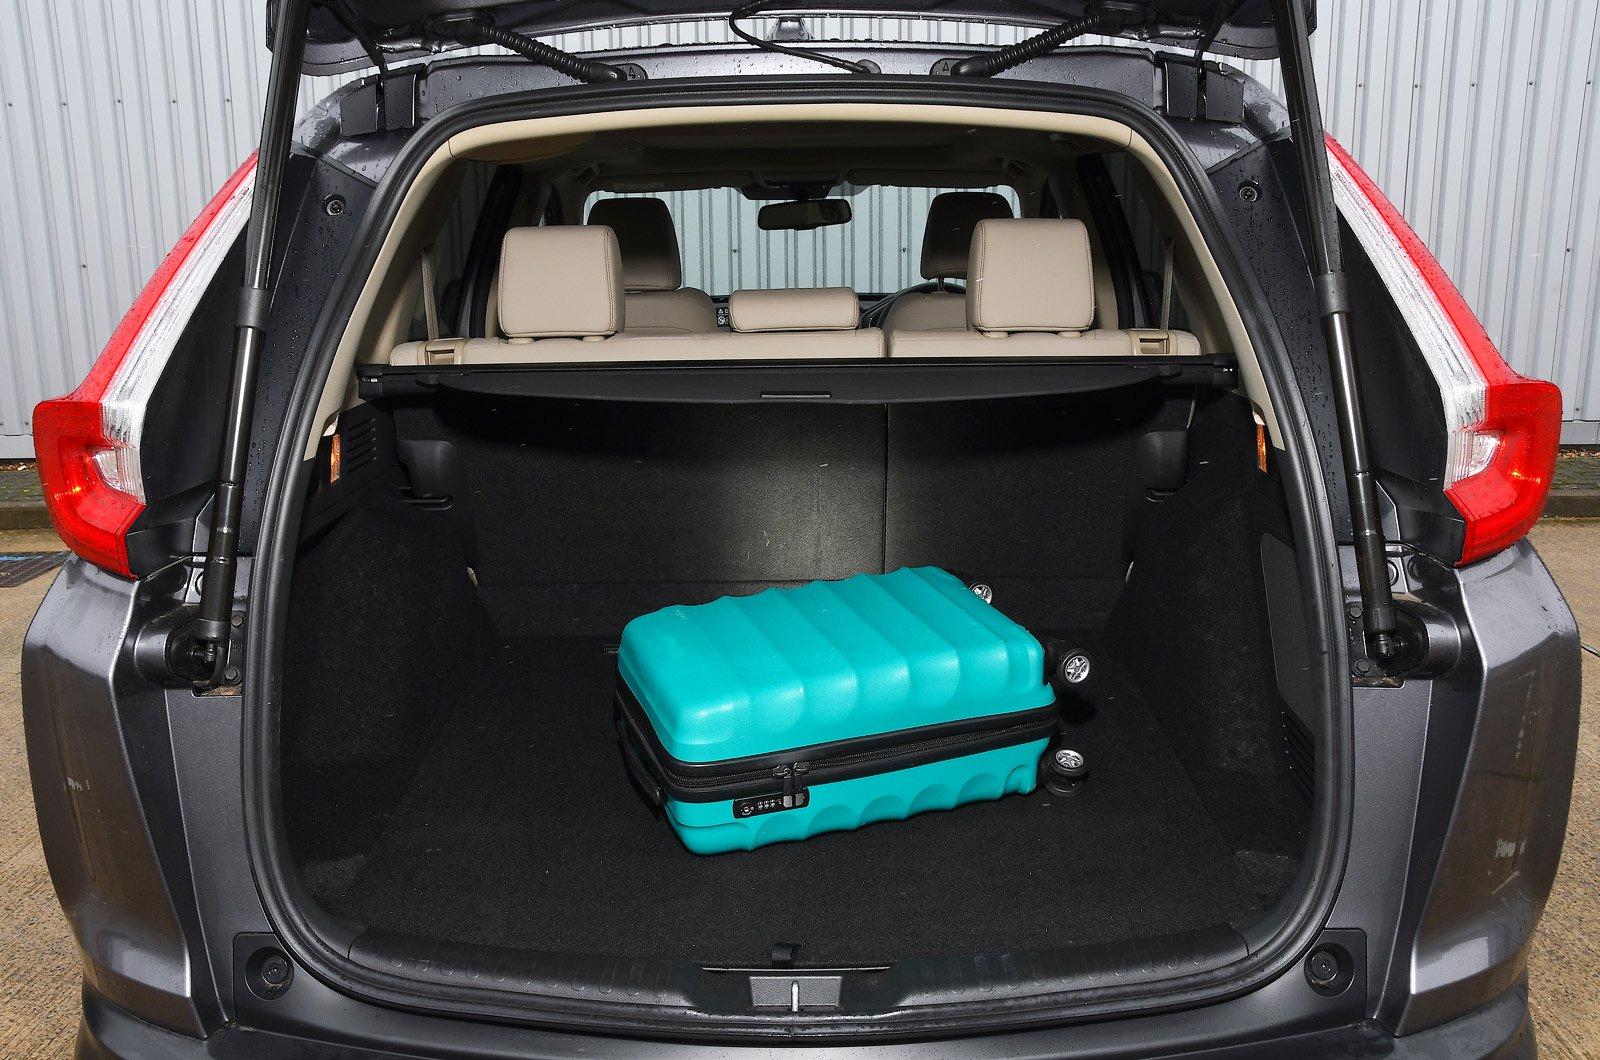 Honda CR-V 2021 boot